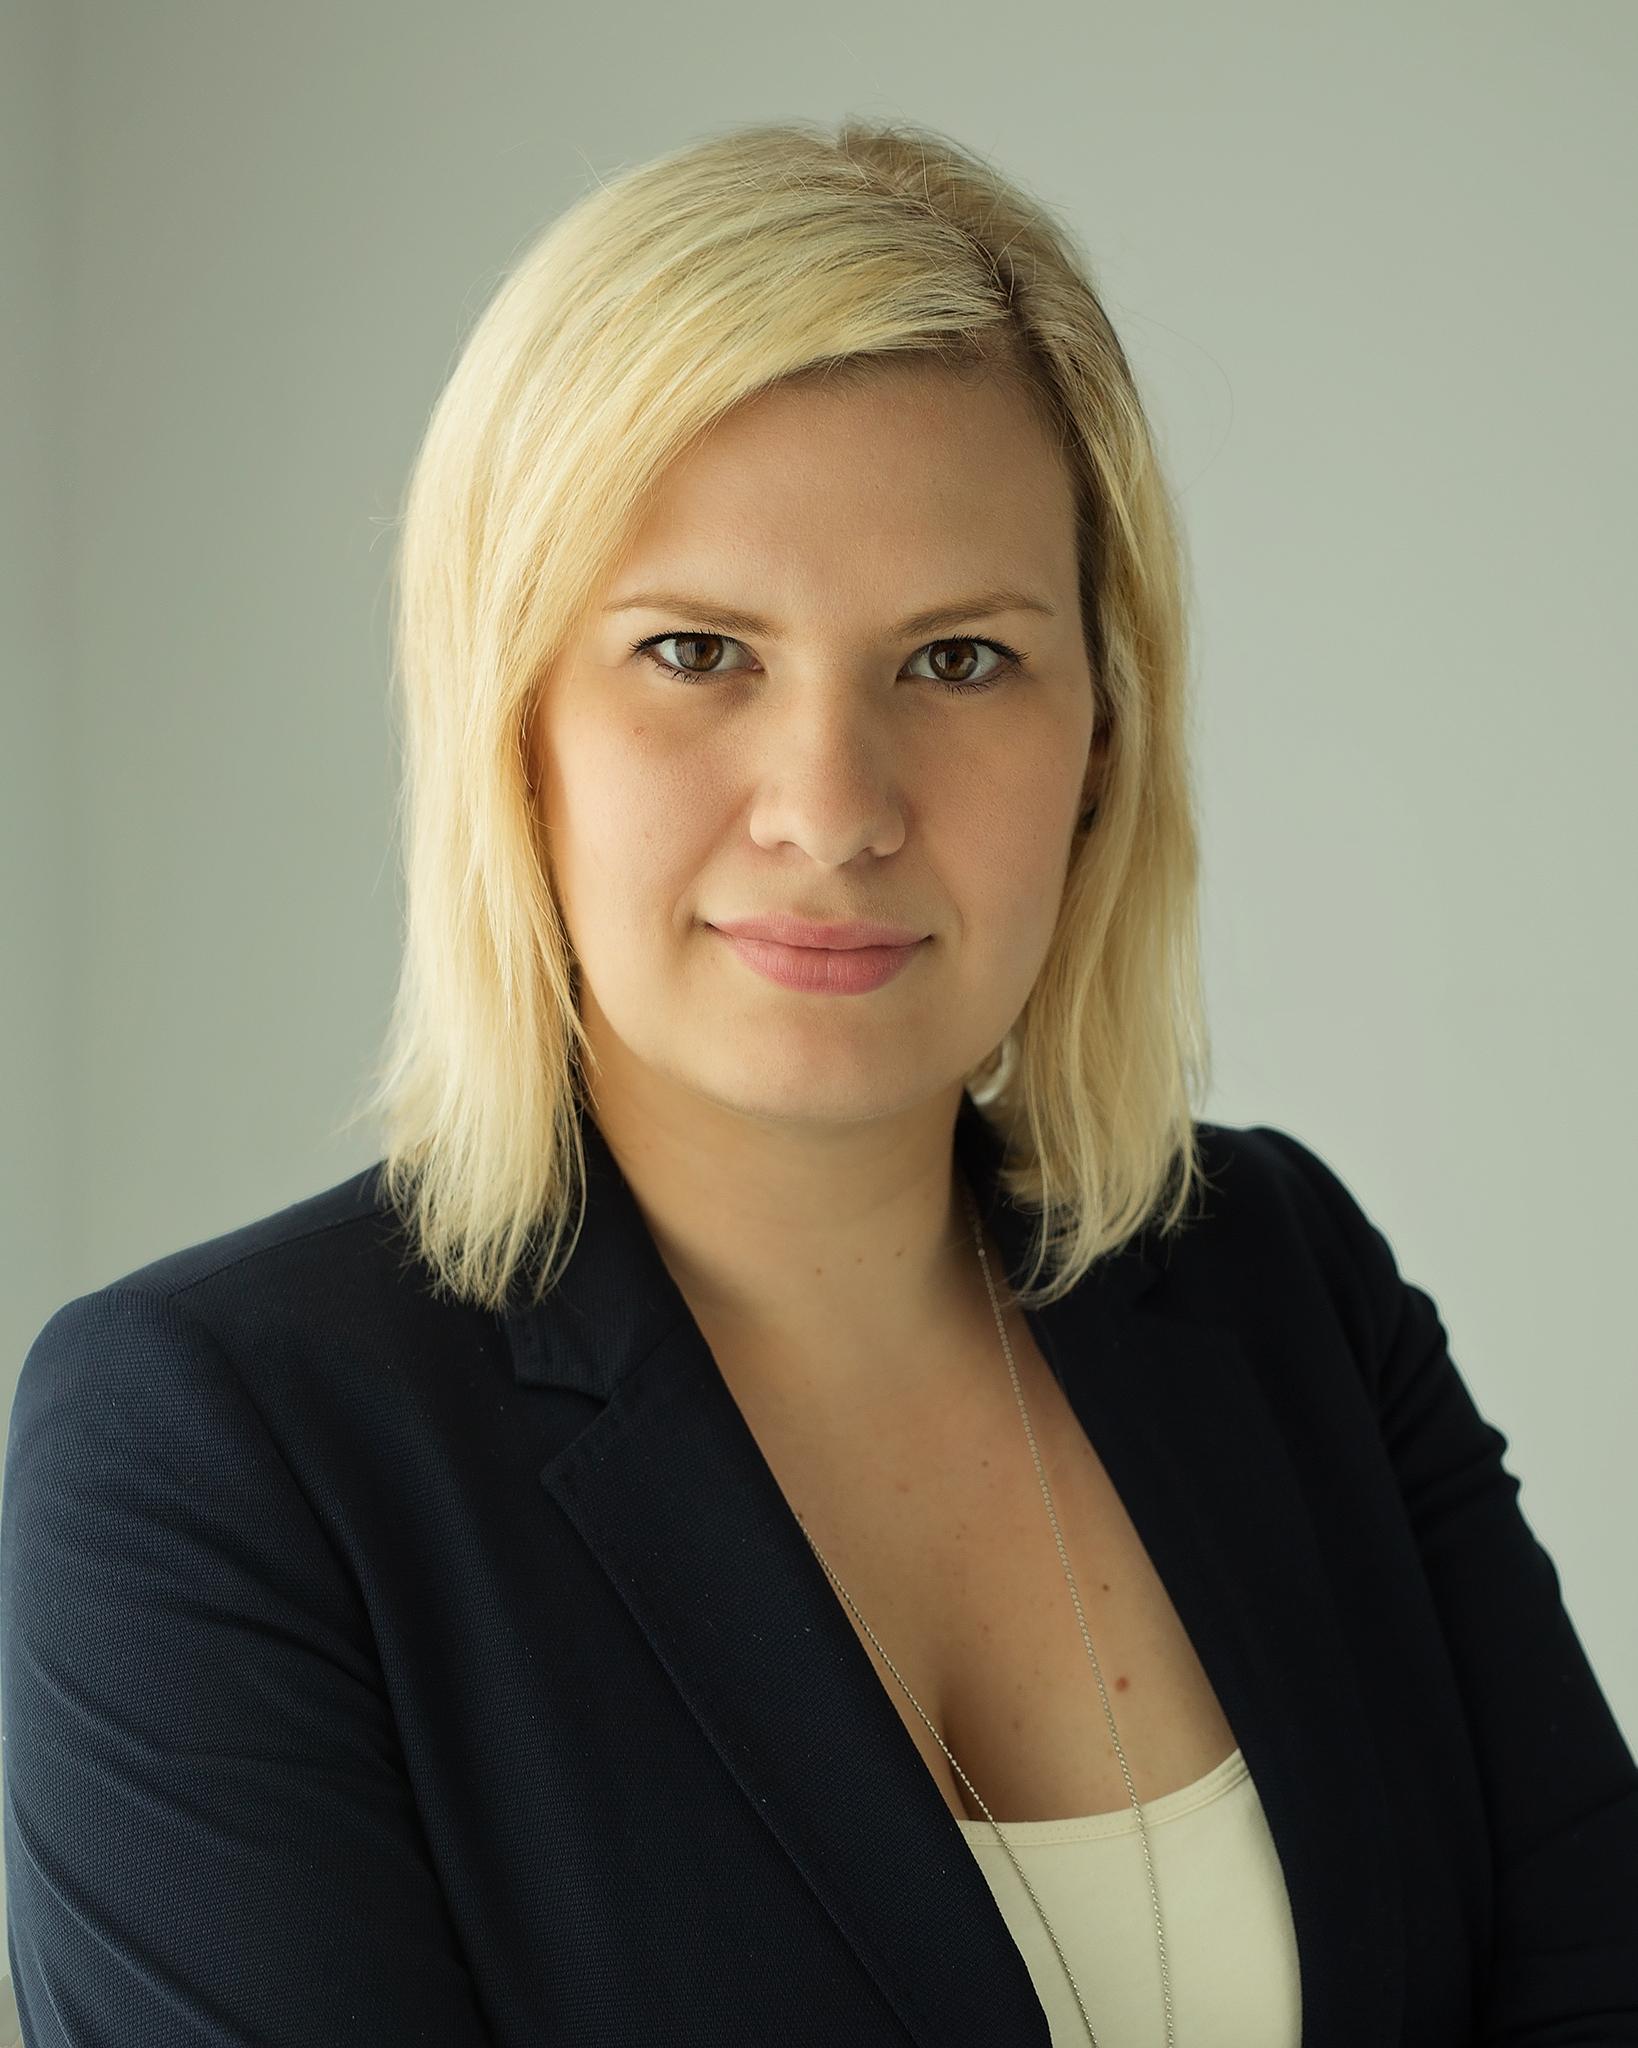 Aleksandra Lenarczyk